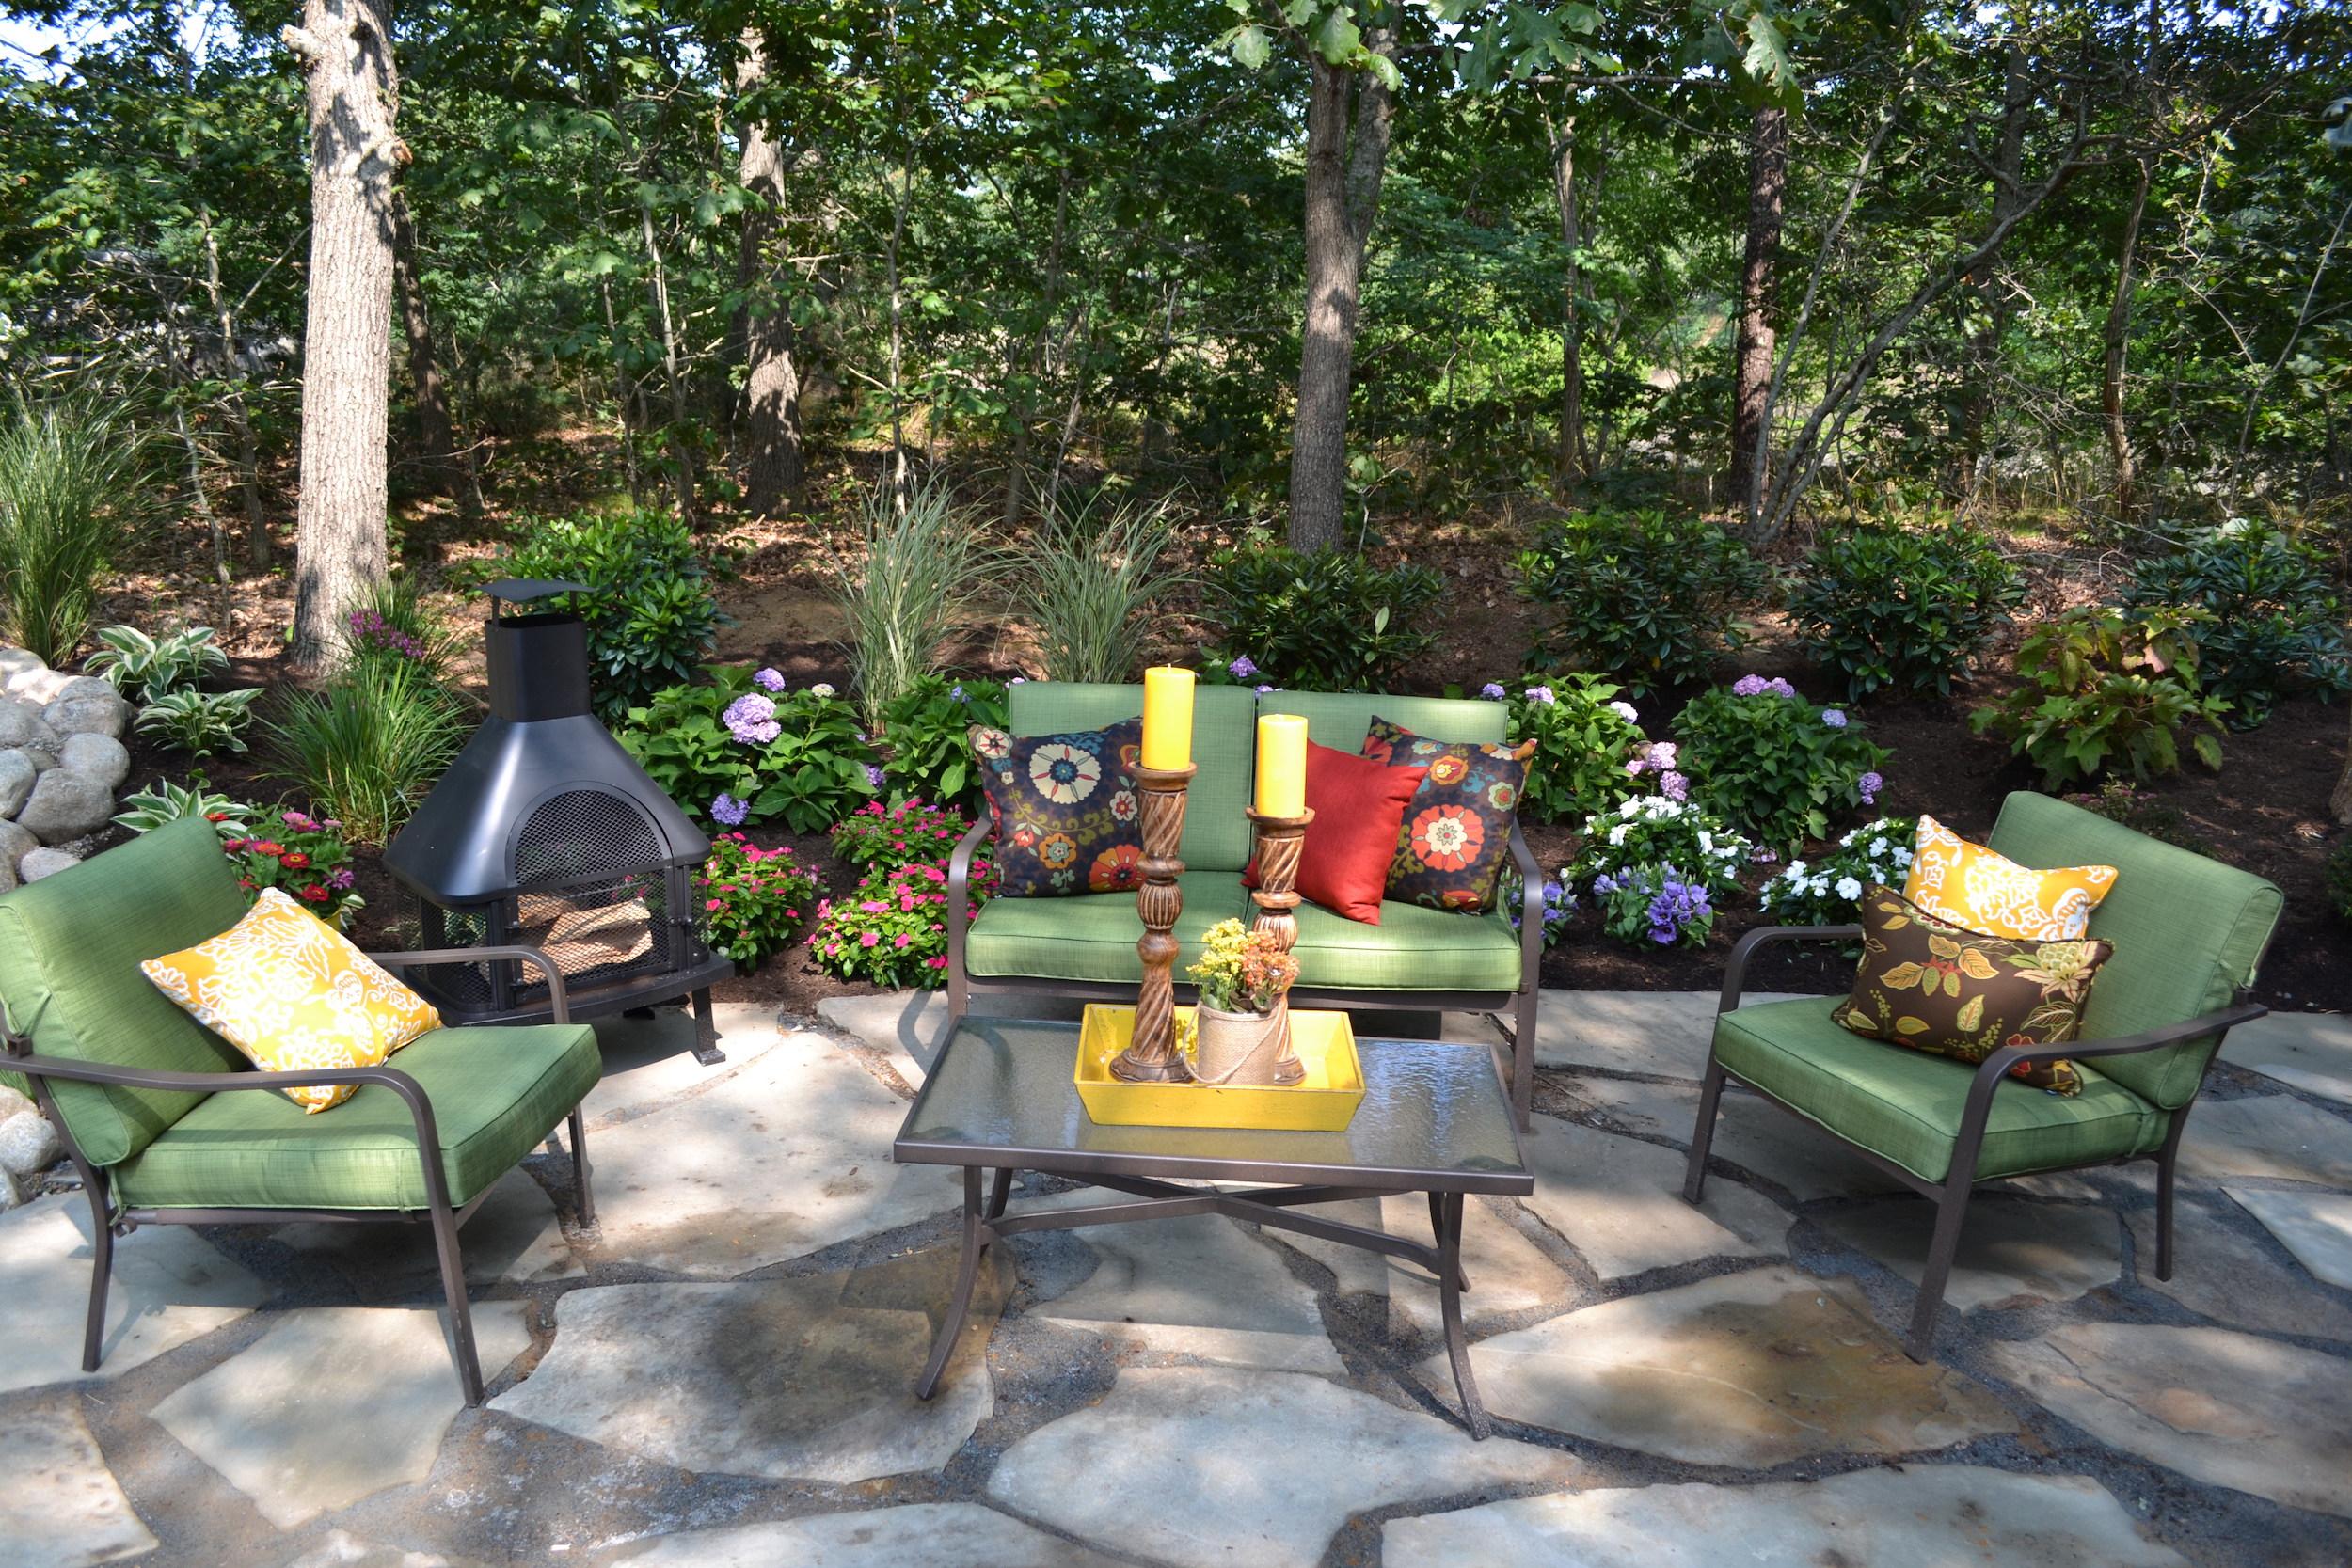 17 Low Maintenance Landscaping Ideas - Chris and Peyton ... on Low Maintenance:cyizg0Gje0G= Backyard Designs  id=95837